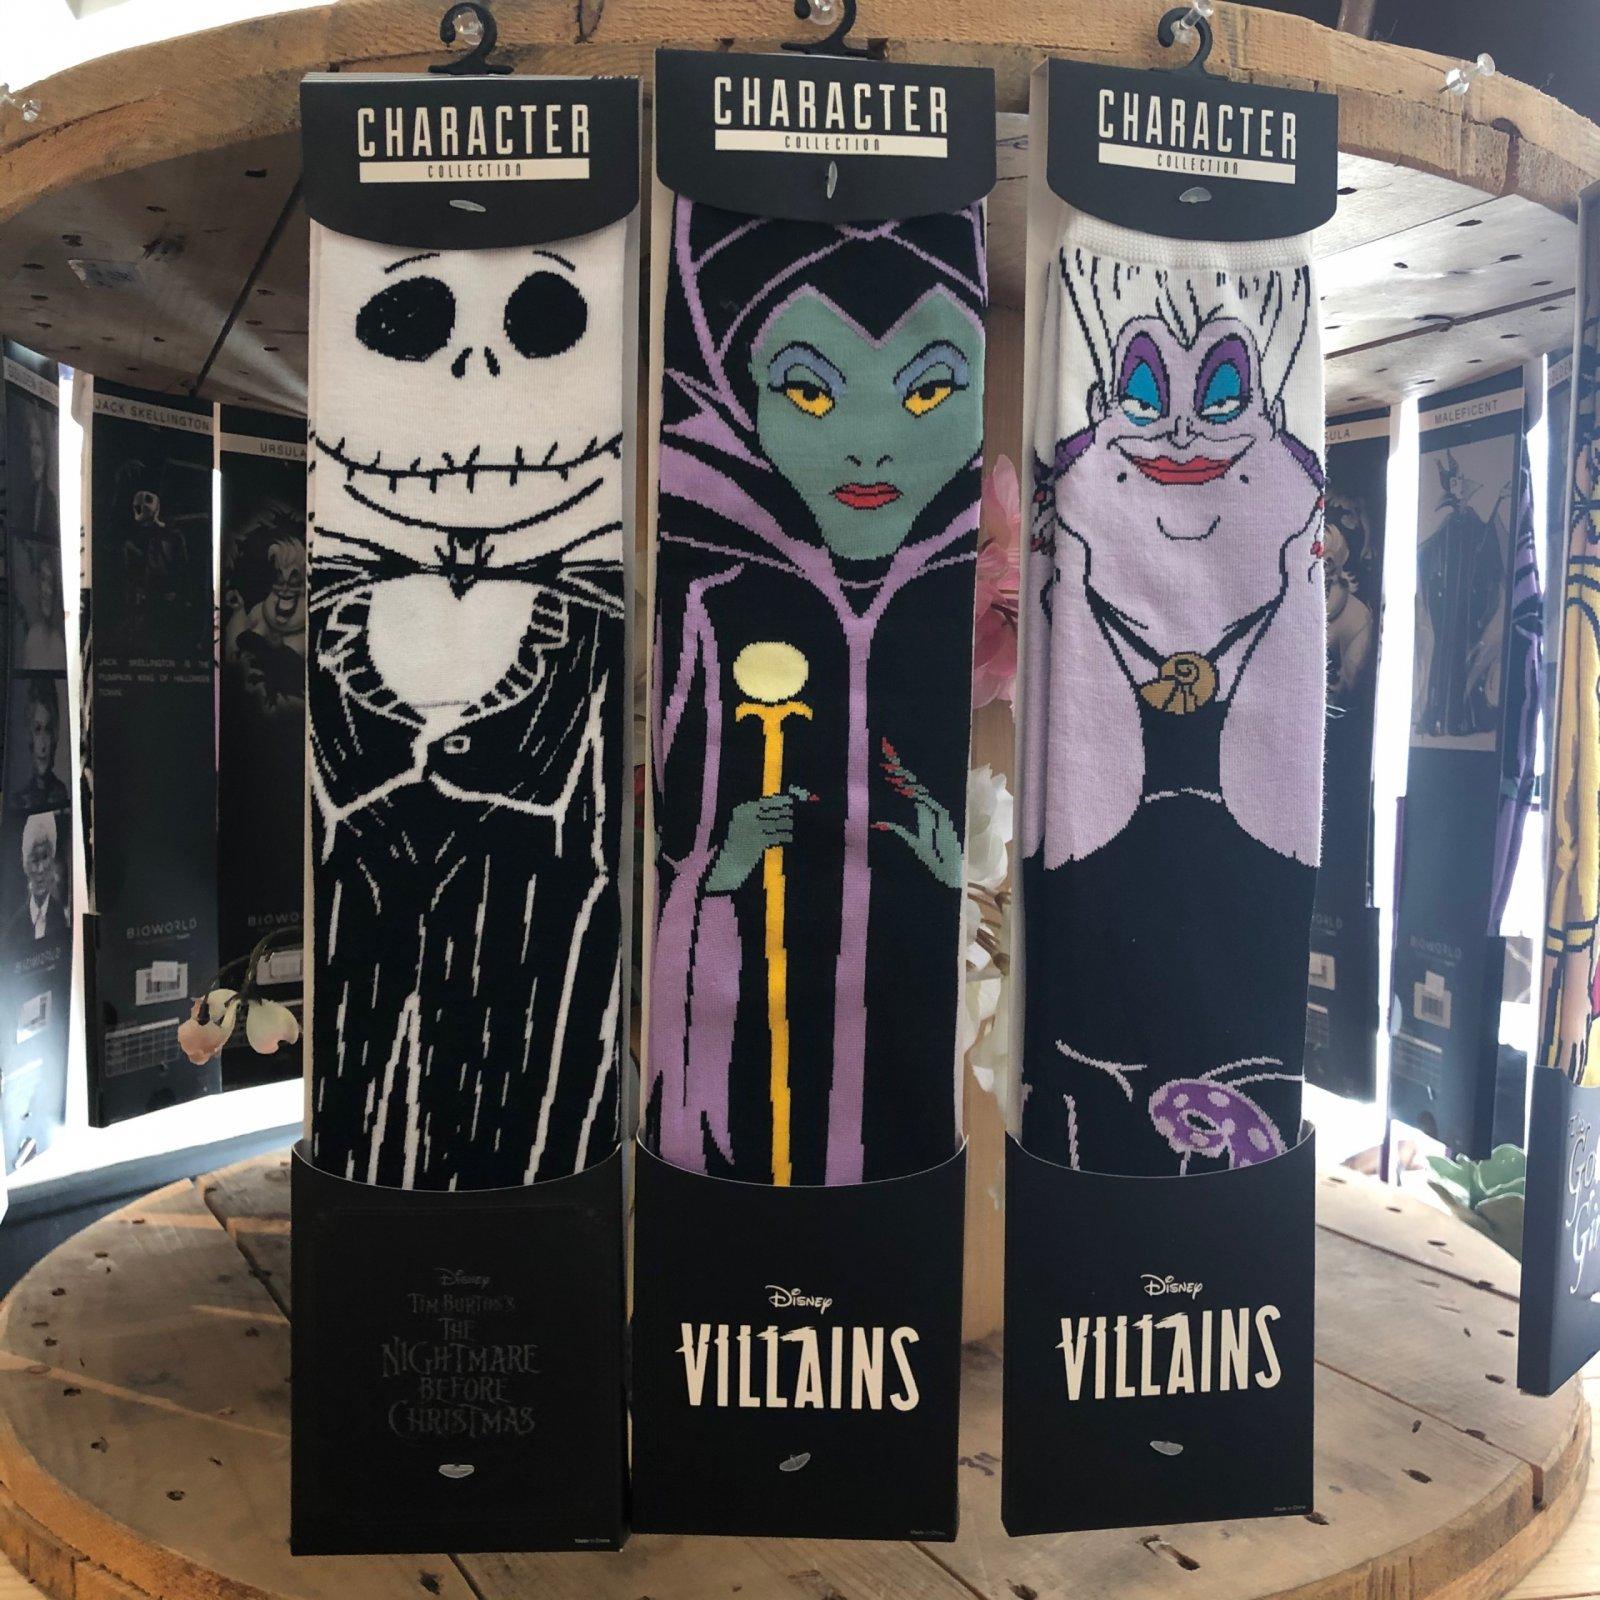 Villian Socks (Ursula, Jack, Maleficent)